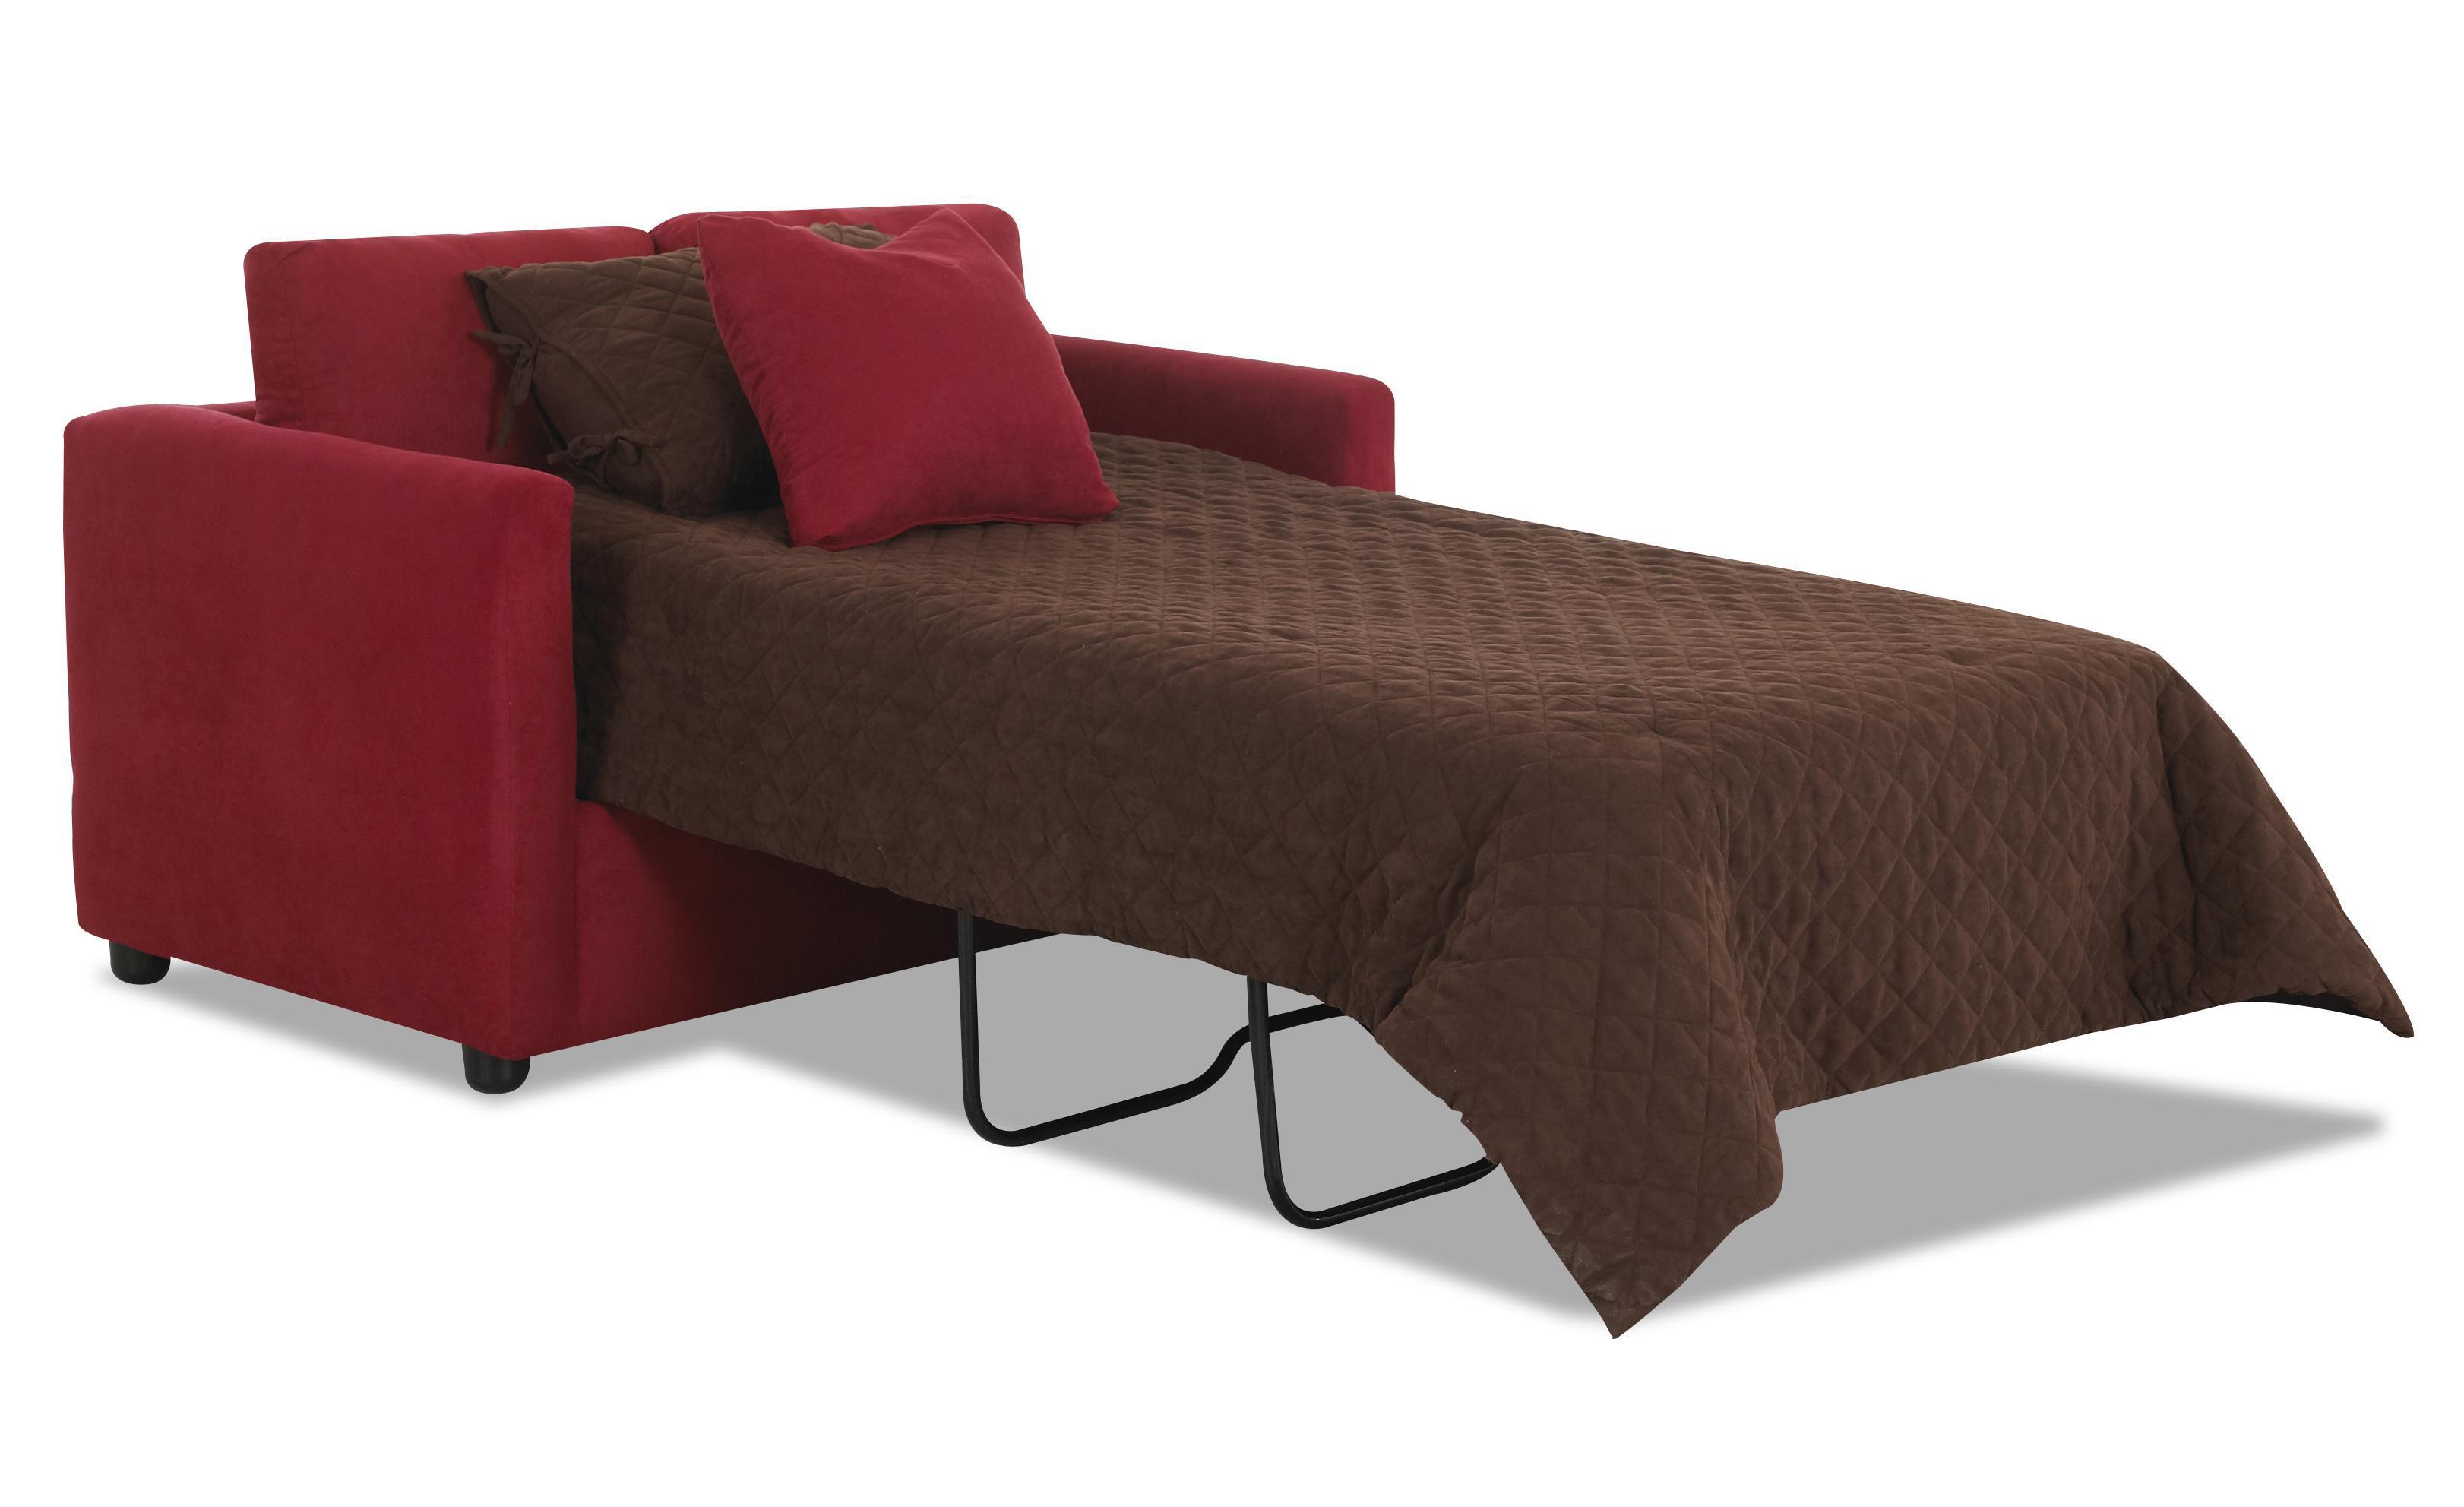 Klaussner Jacobs Casual Twin Sleeper Sofa Value City Furniture Sleeper Sofas